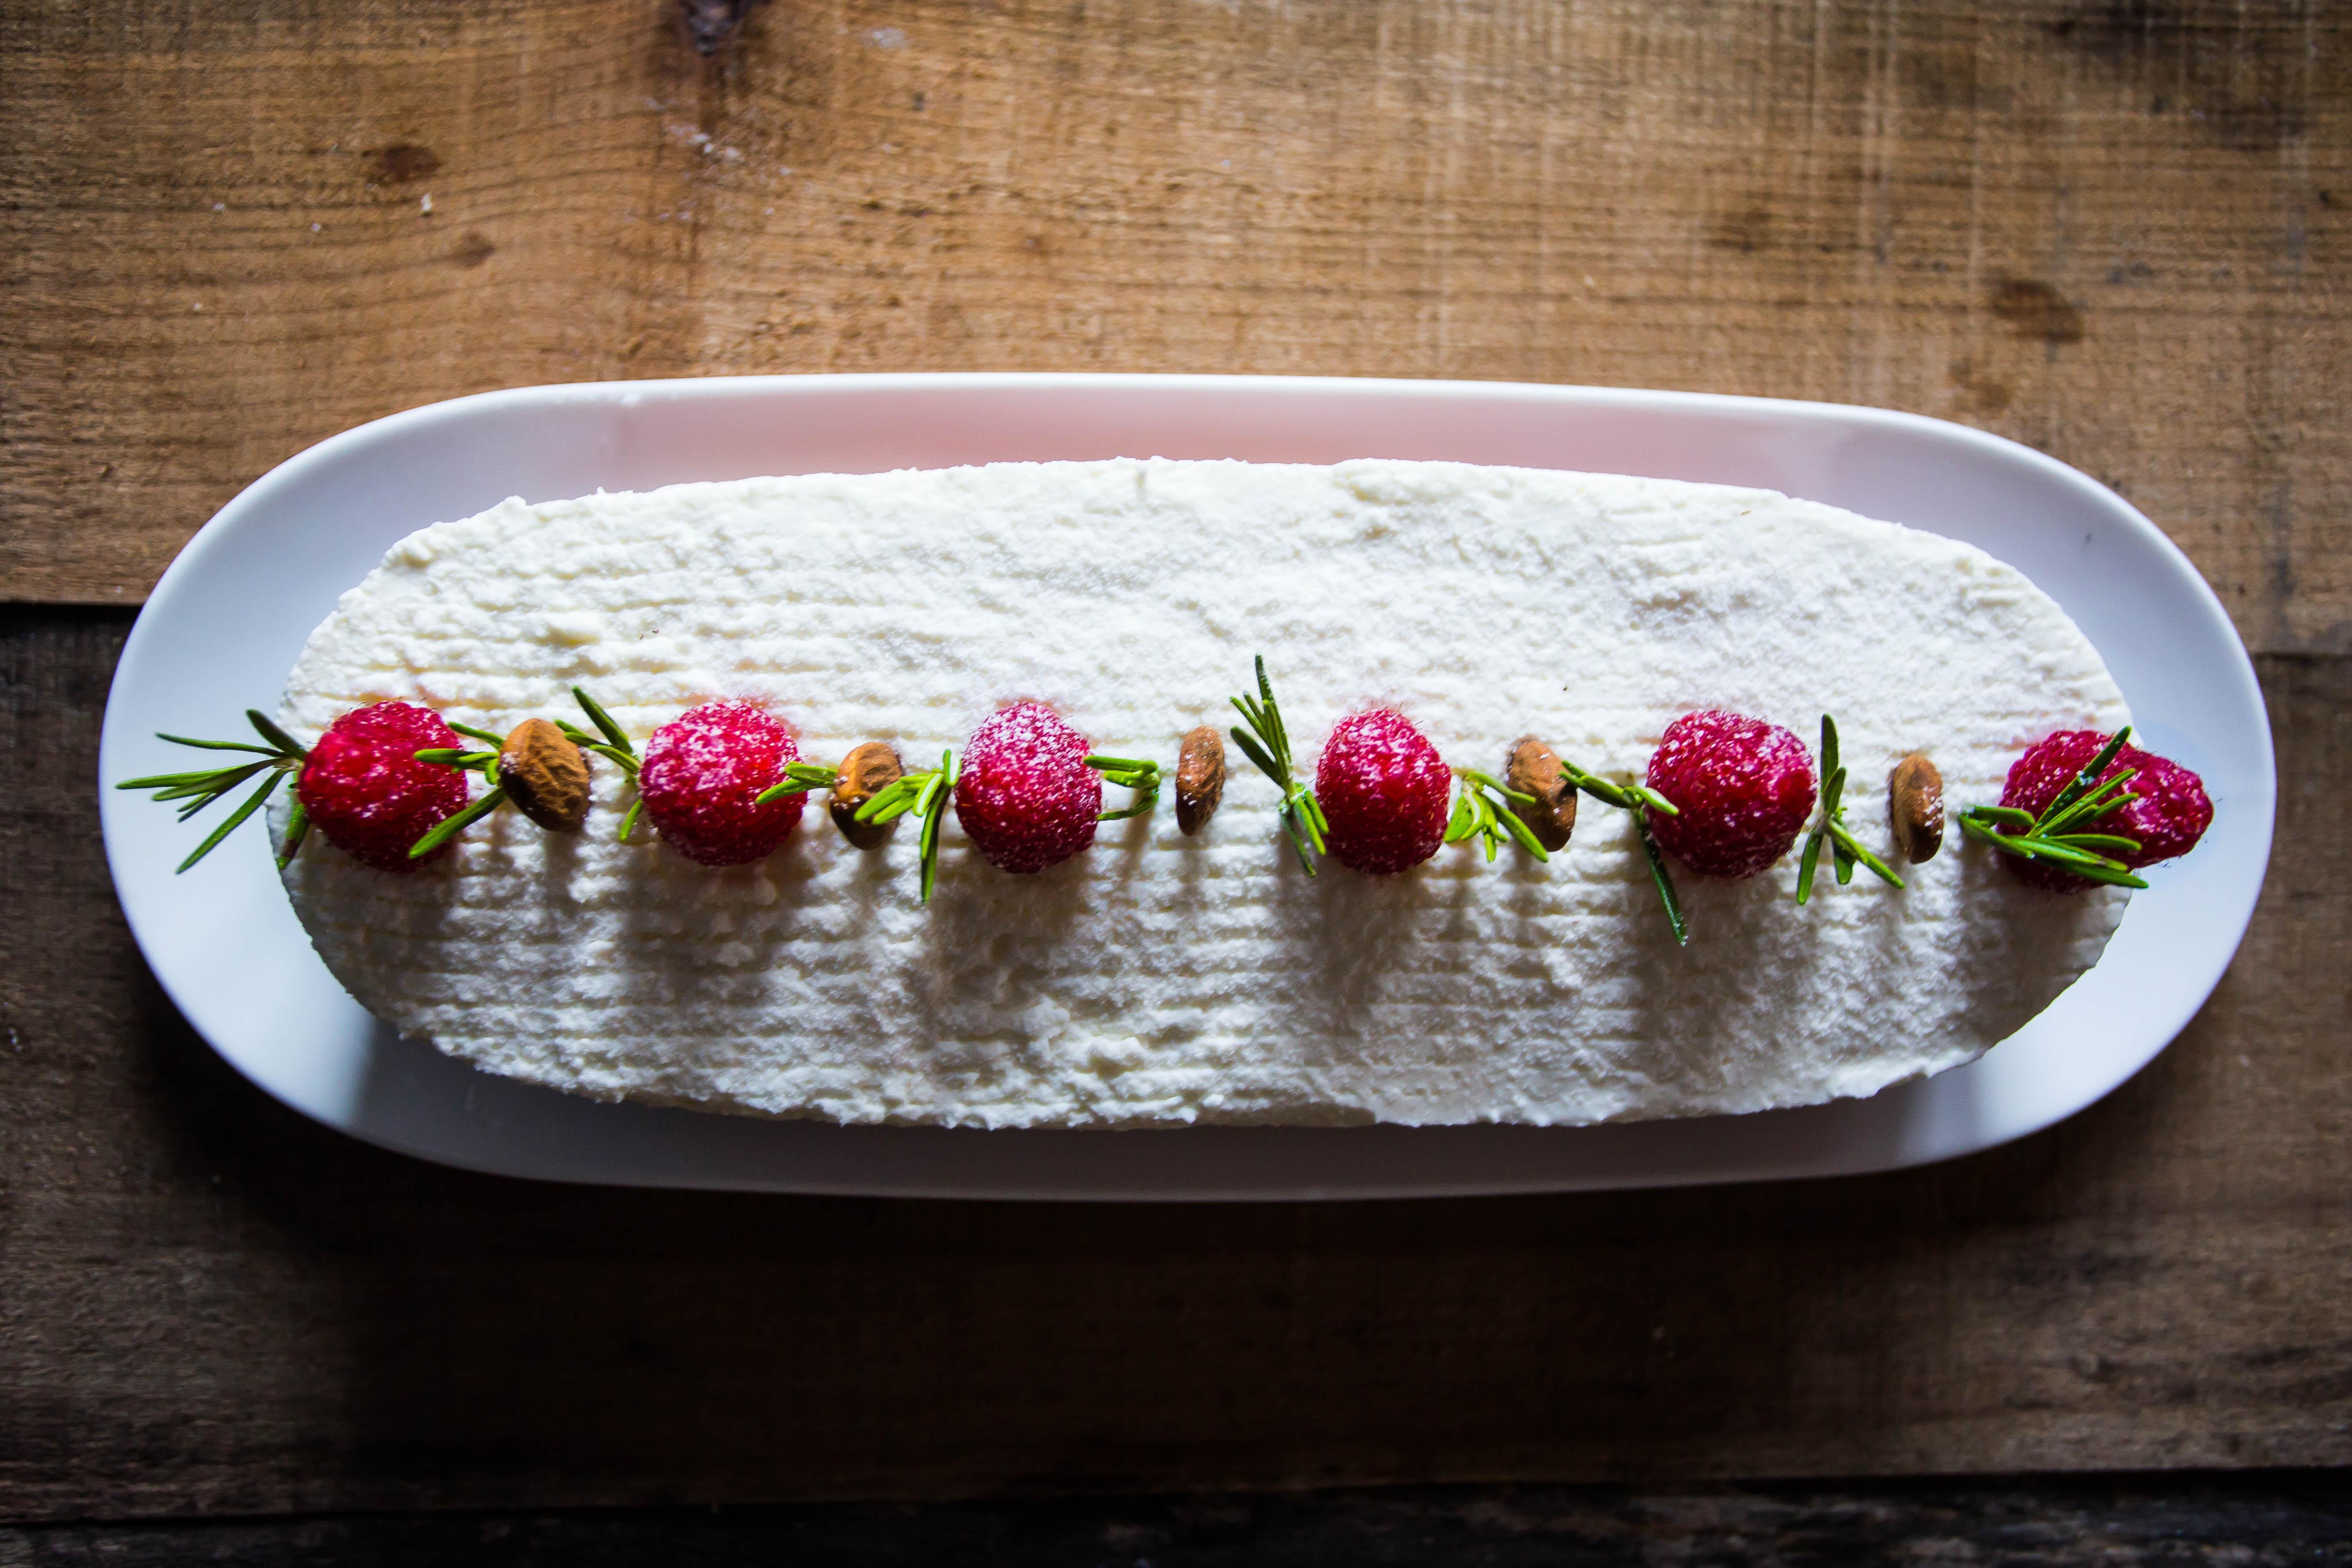 Rosemary, rhubarb's french elegance